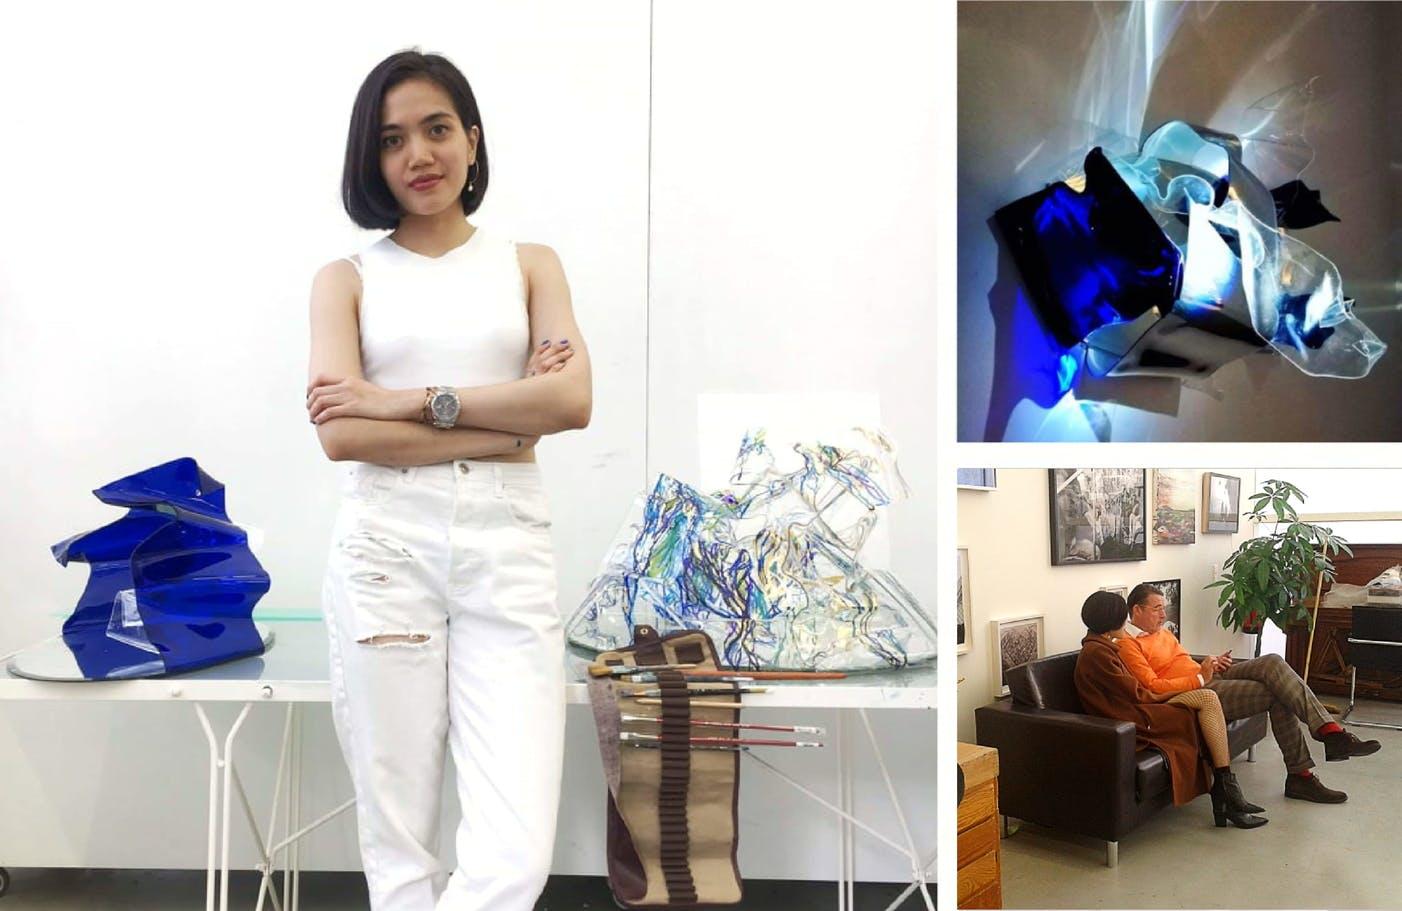 Artist-Residency-Berlin-coGalleries-Gallery-Studio-Artwork-Exhibition-Interview-Talitha-Maranila